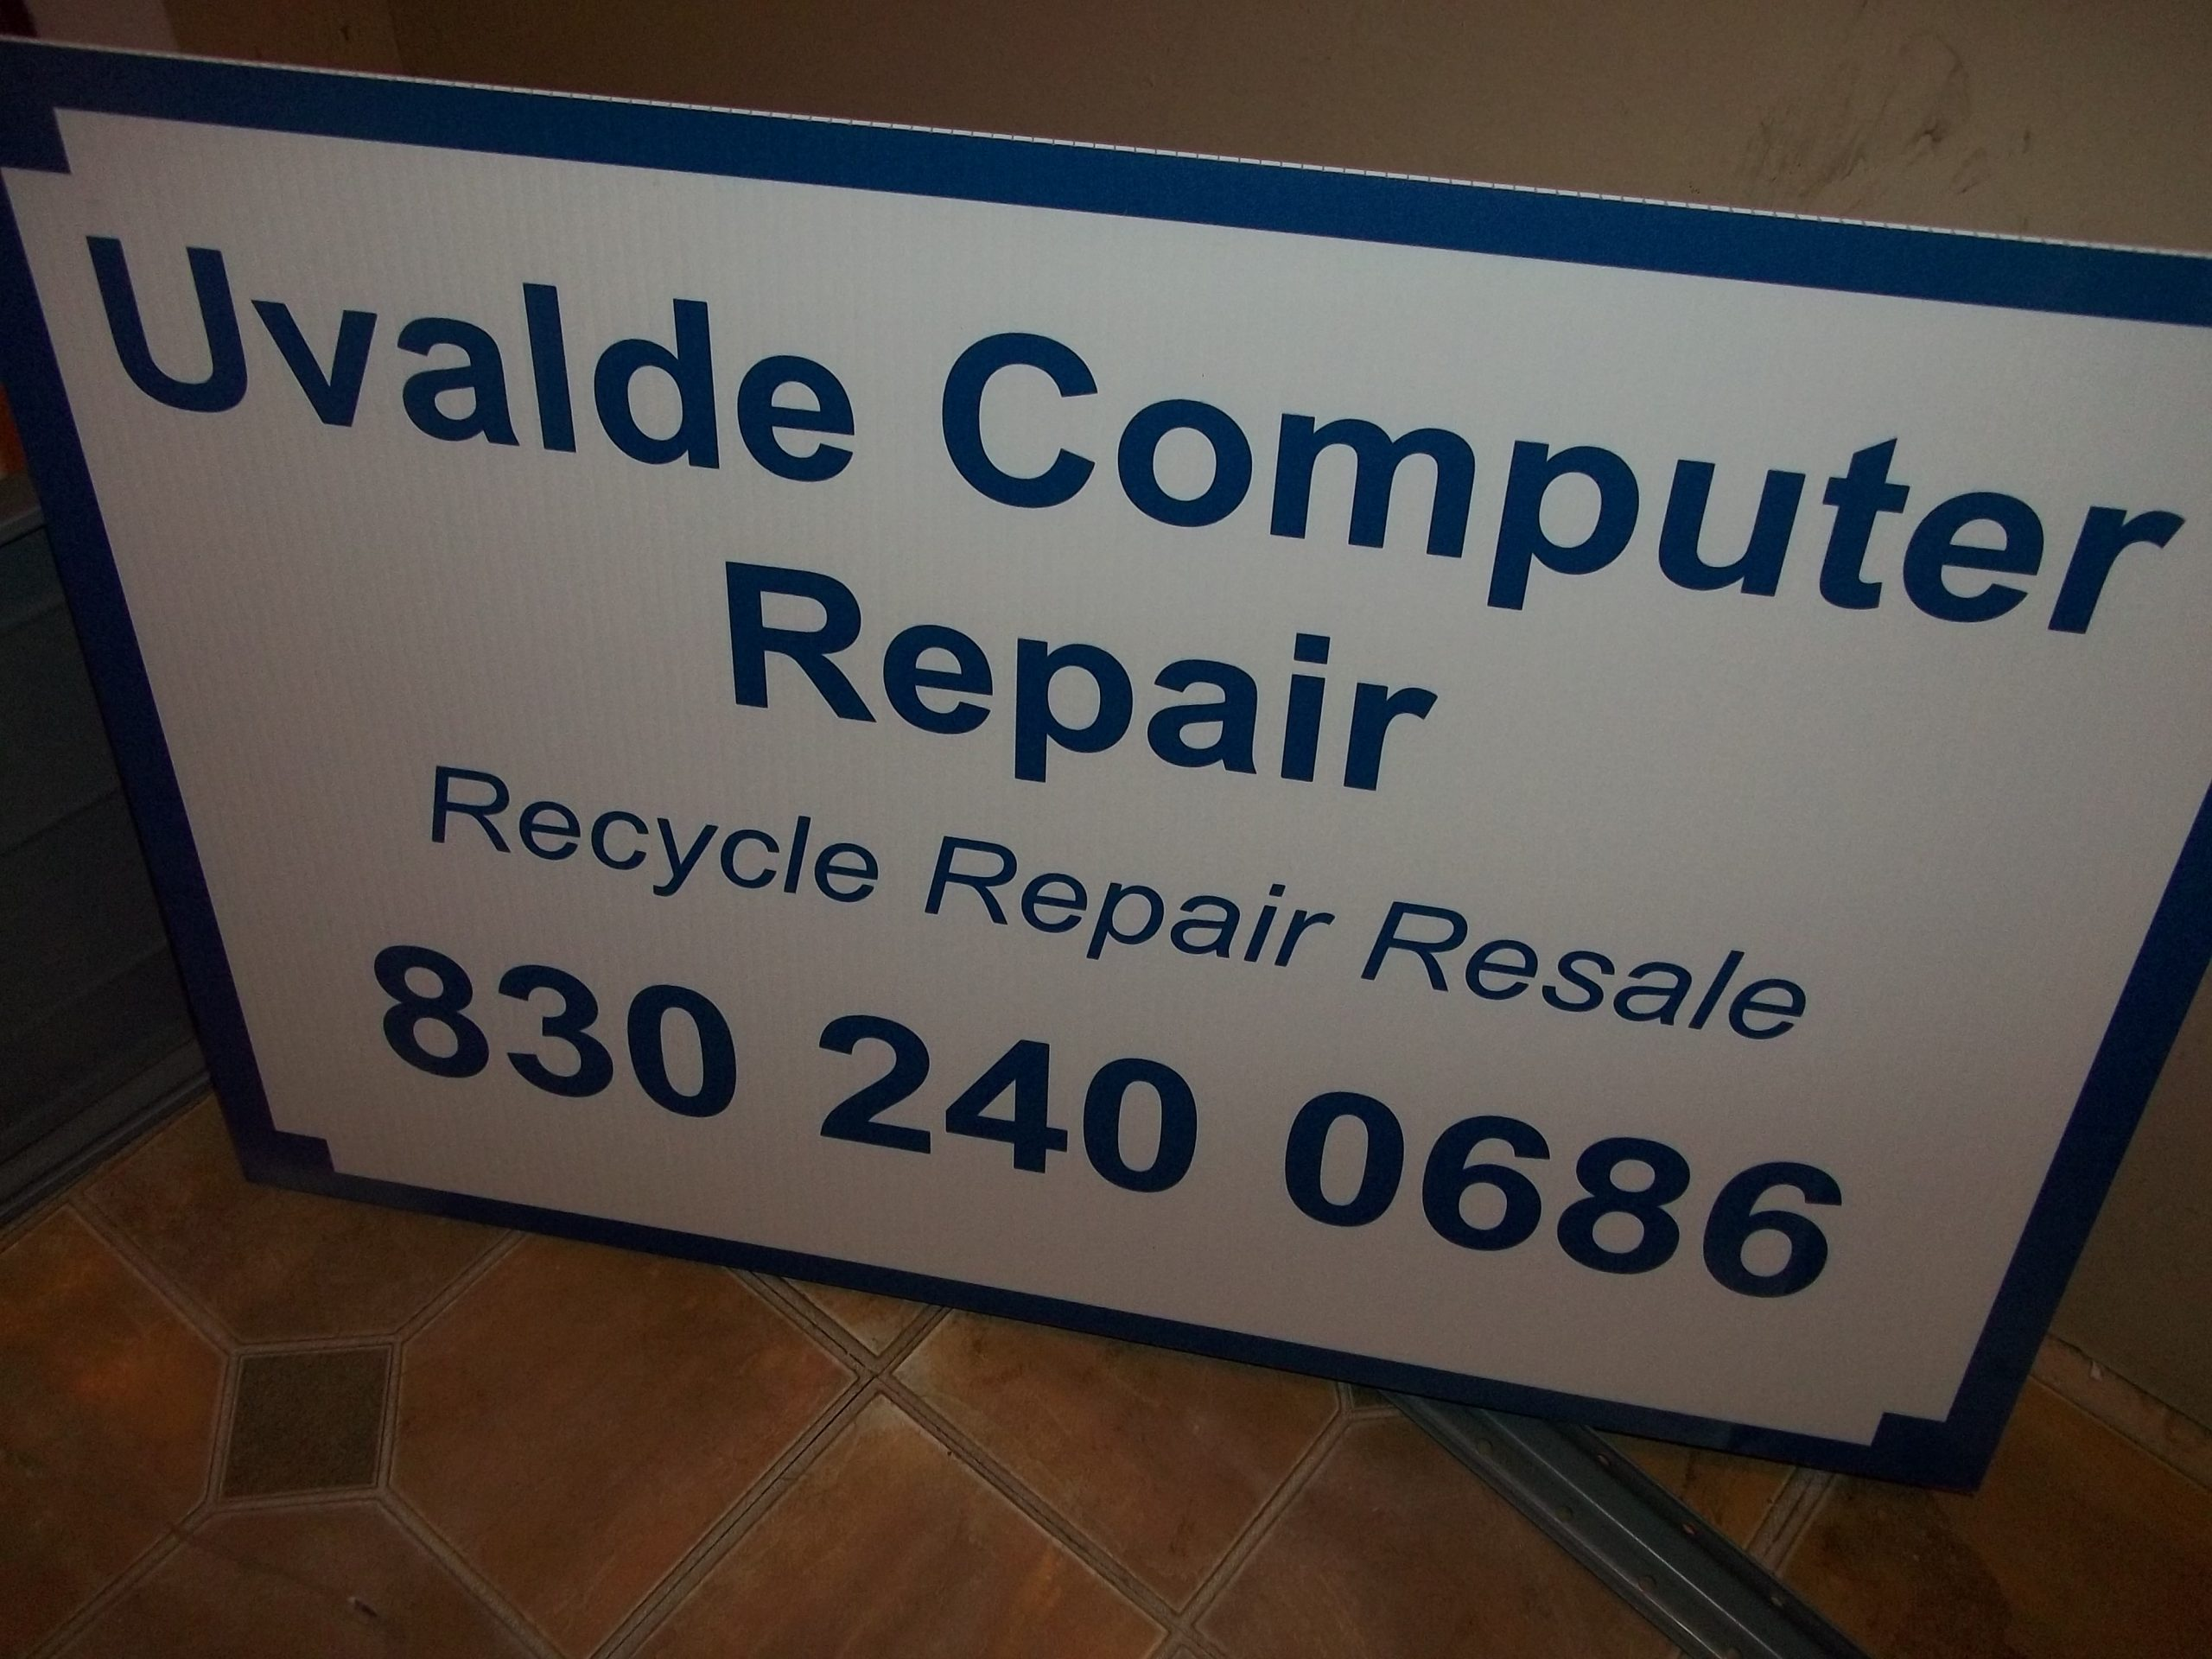 Uvalde Computer Repair Sign